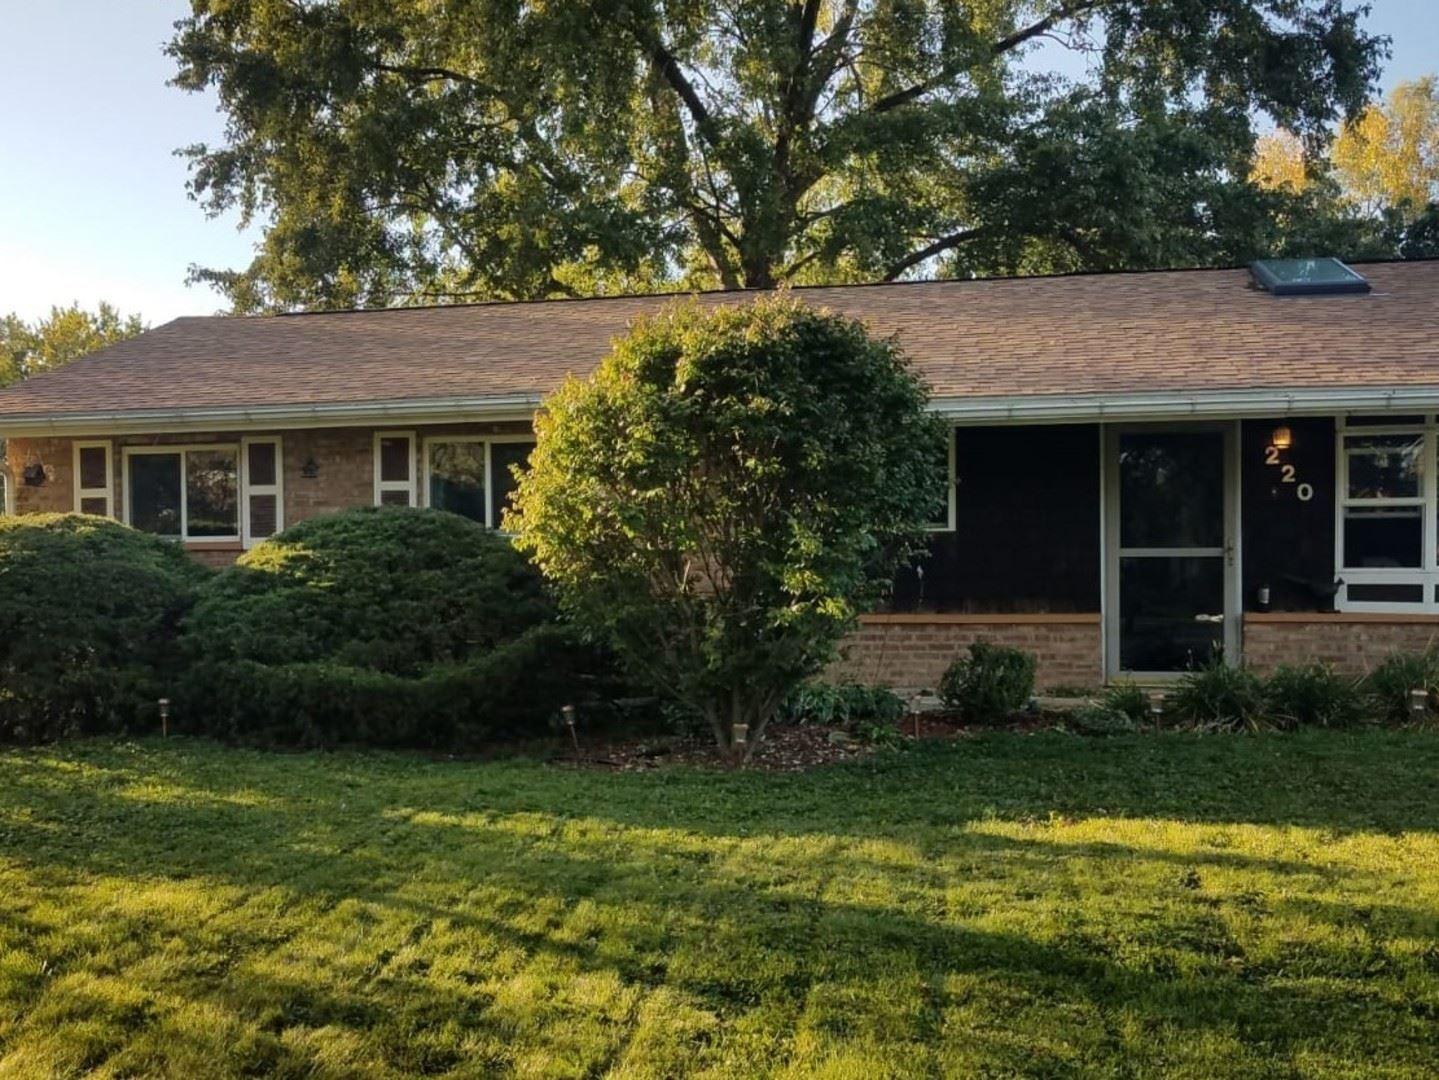 Photo of 220 Glengary Drive, Bolingbrook, IL 60440 (MLS # 10992734)